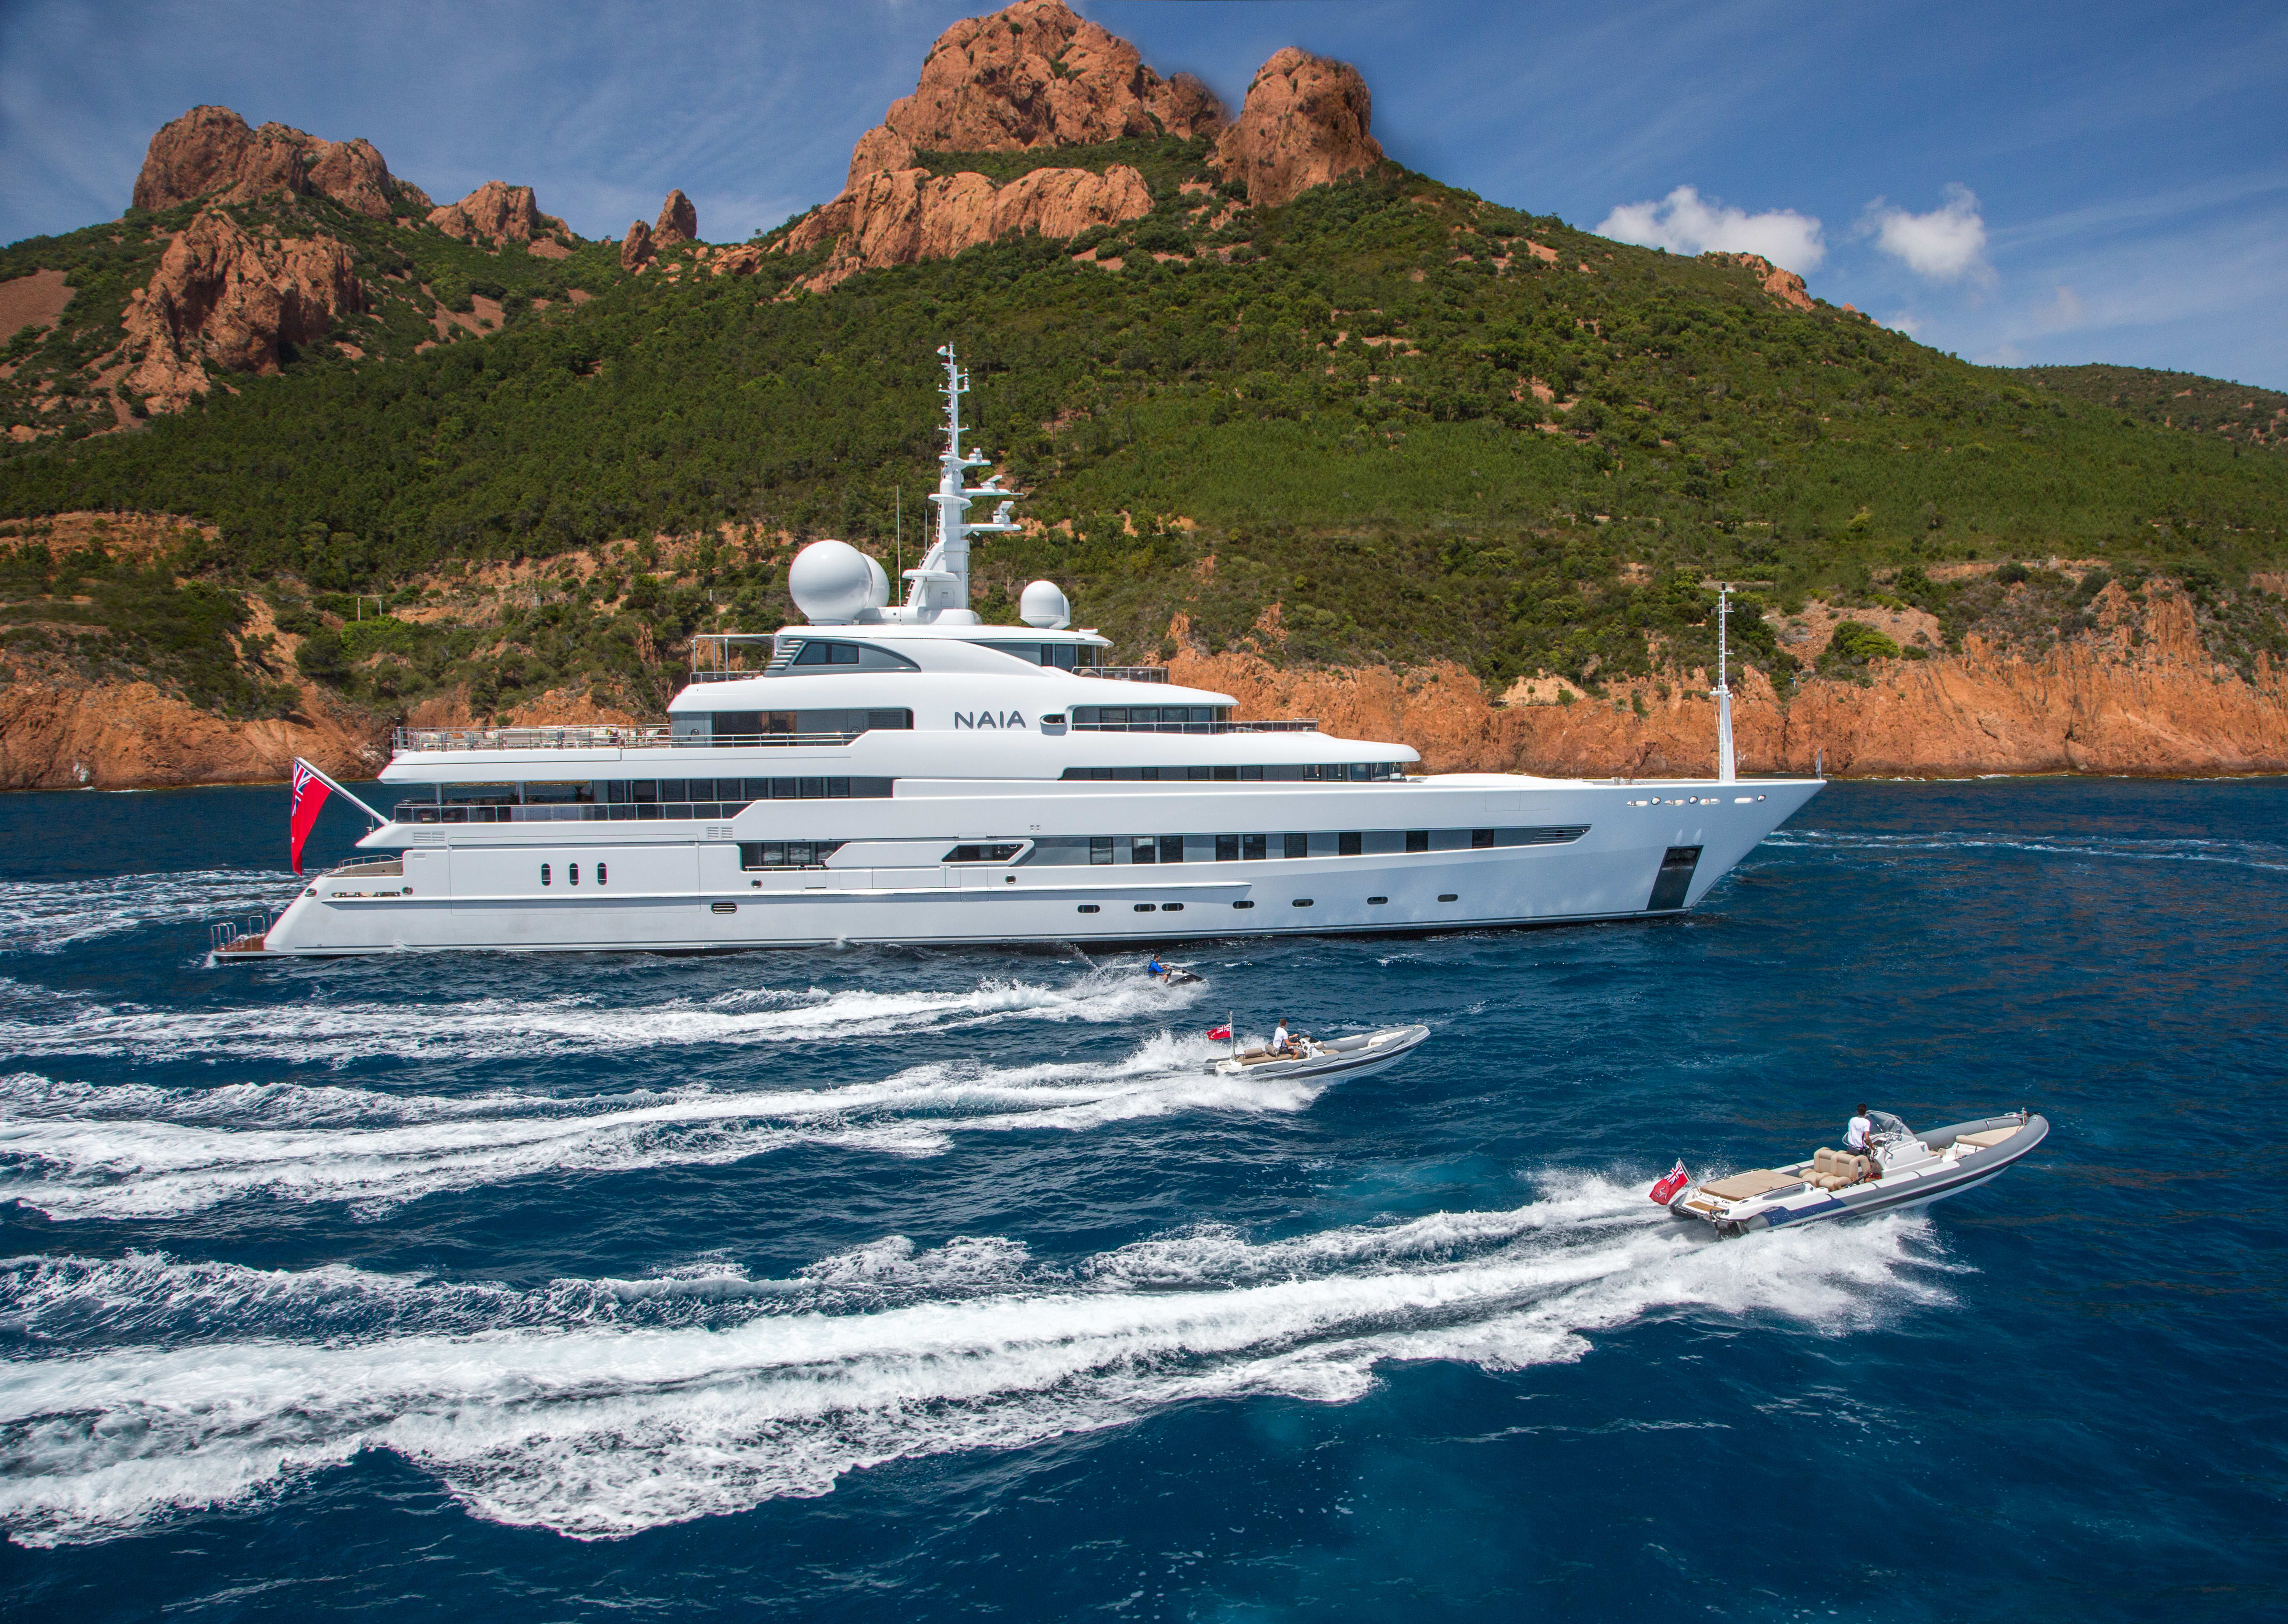 Image of Naia 73.6M (241.5FT) motor yacht